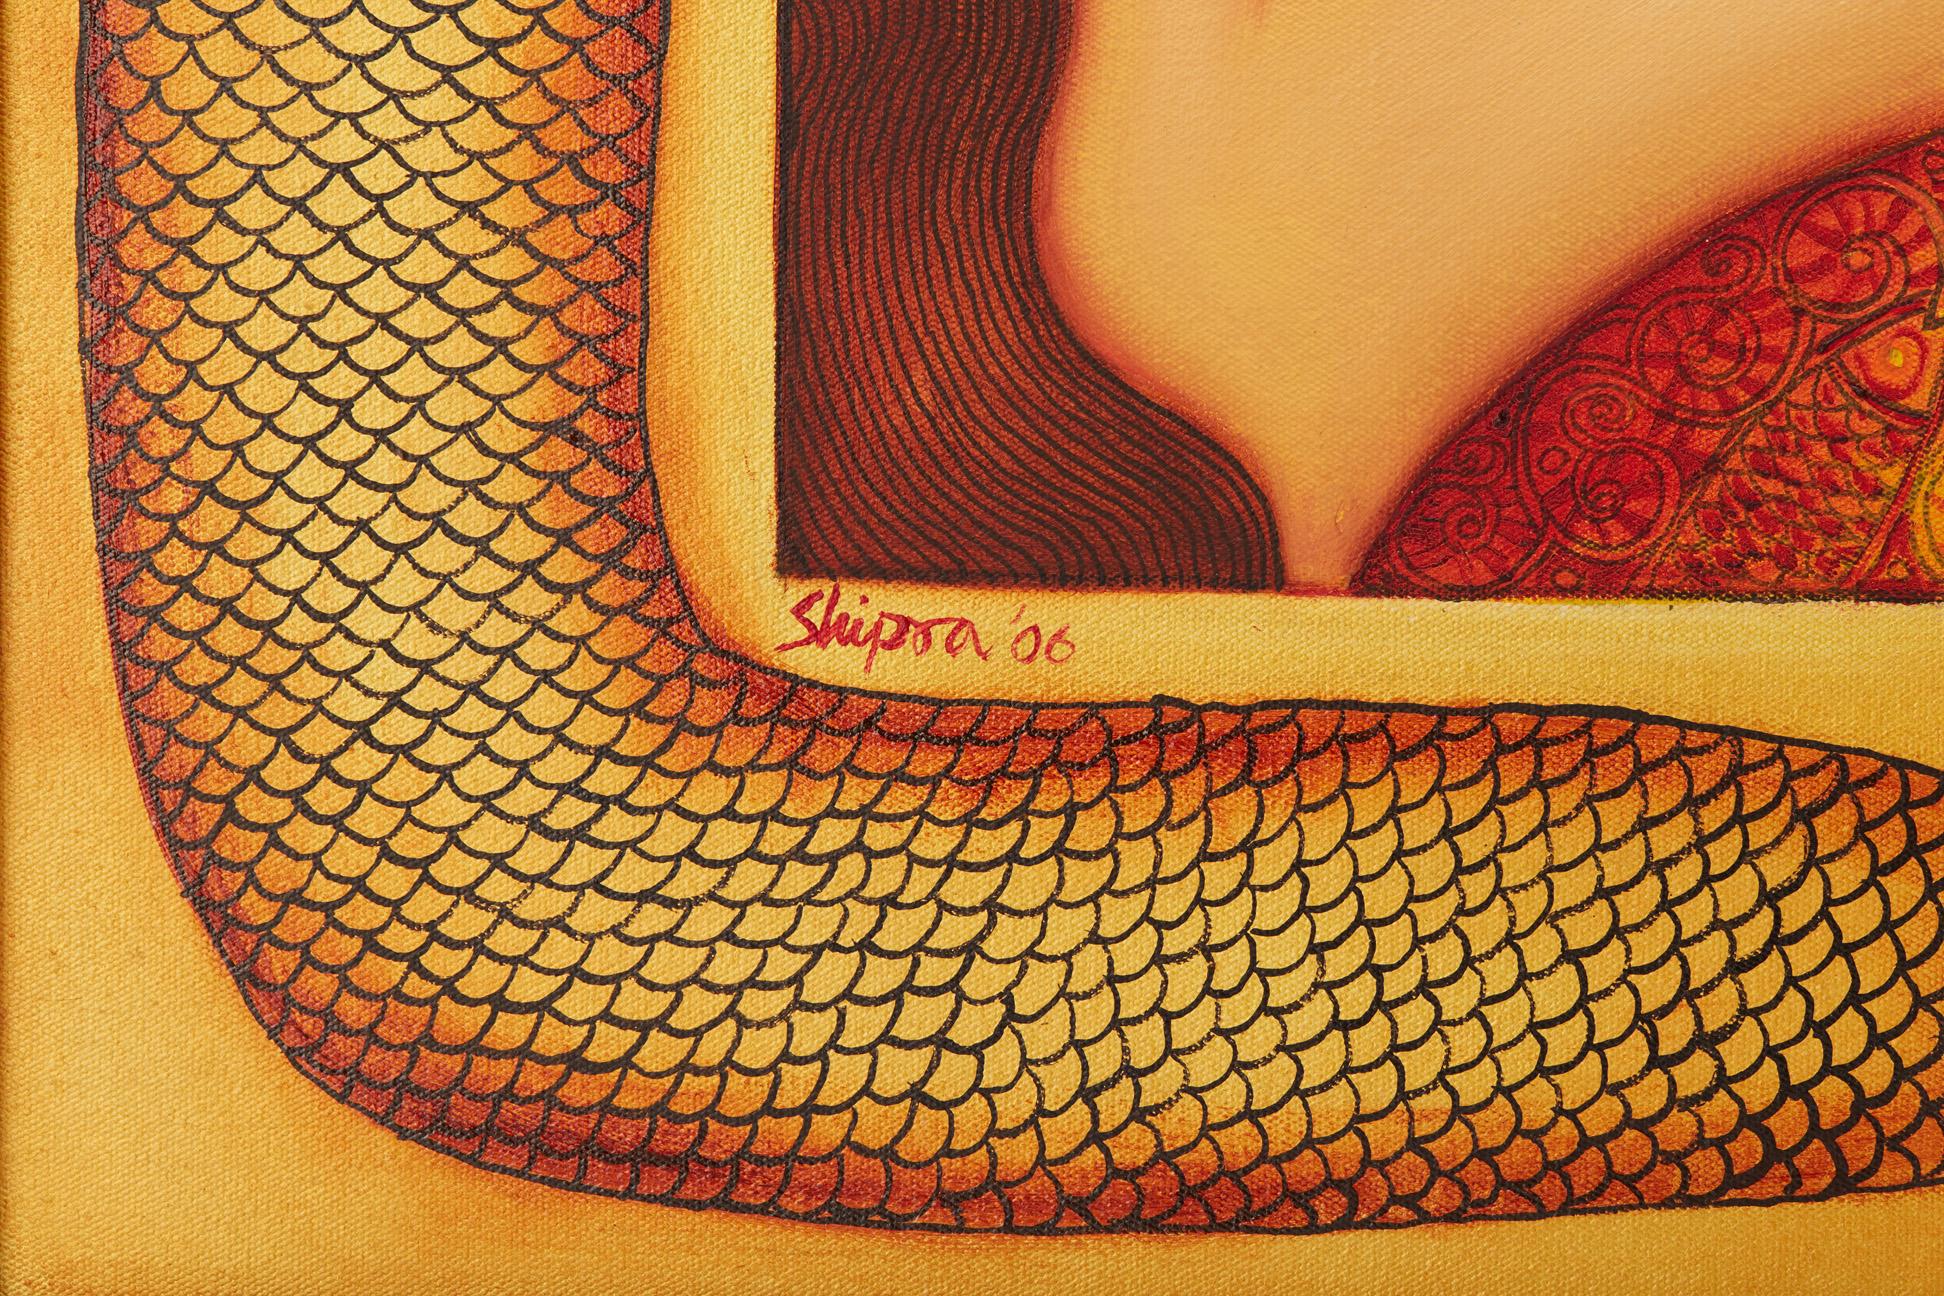 SHIPRA BHATTACHARYA (INDIAN, B.1954) - DESIRE - Image 4 of 5